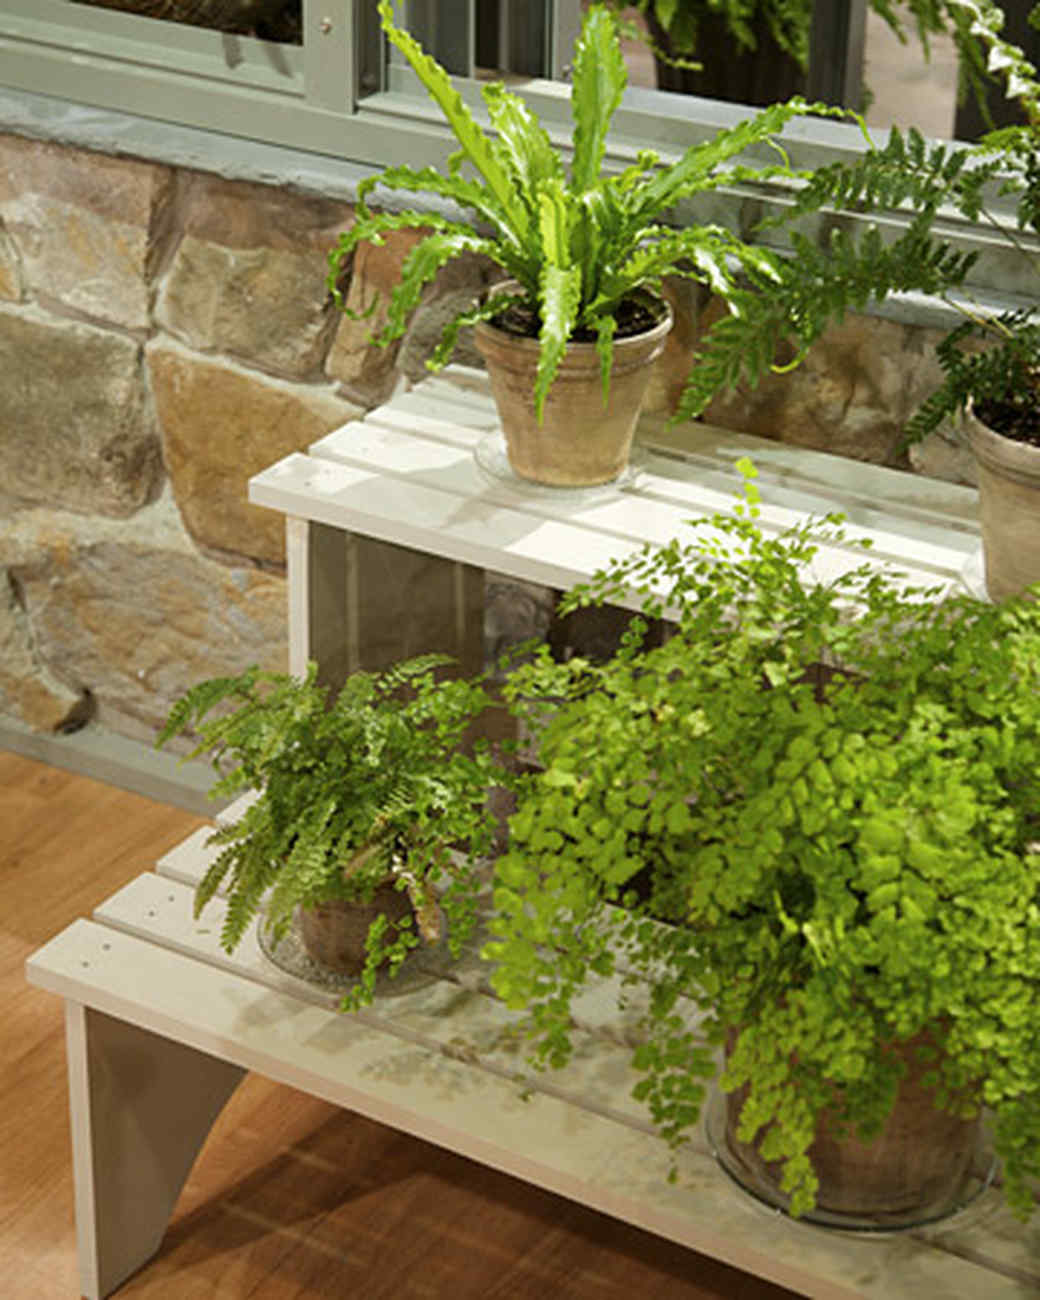 4082_012609_plantstand.jpg